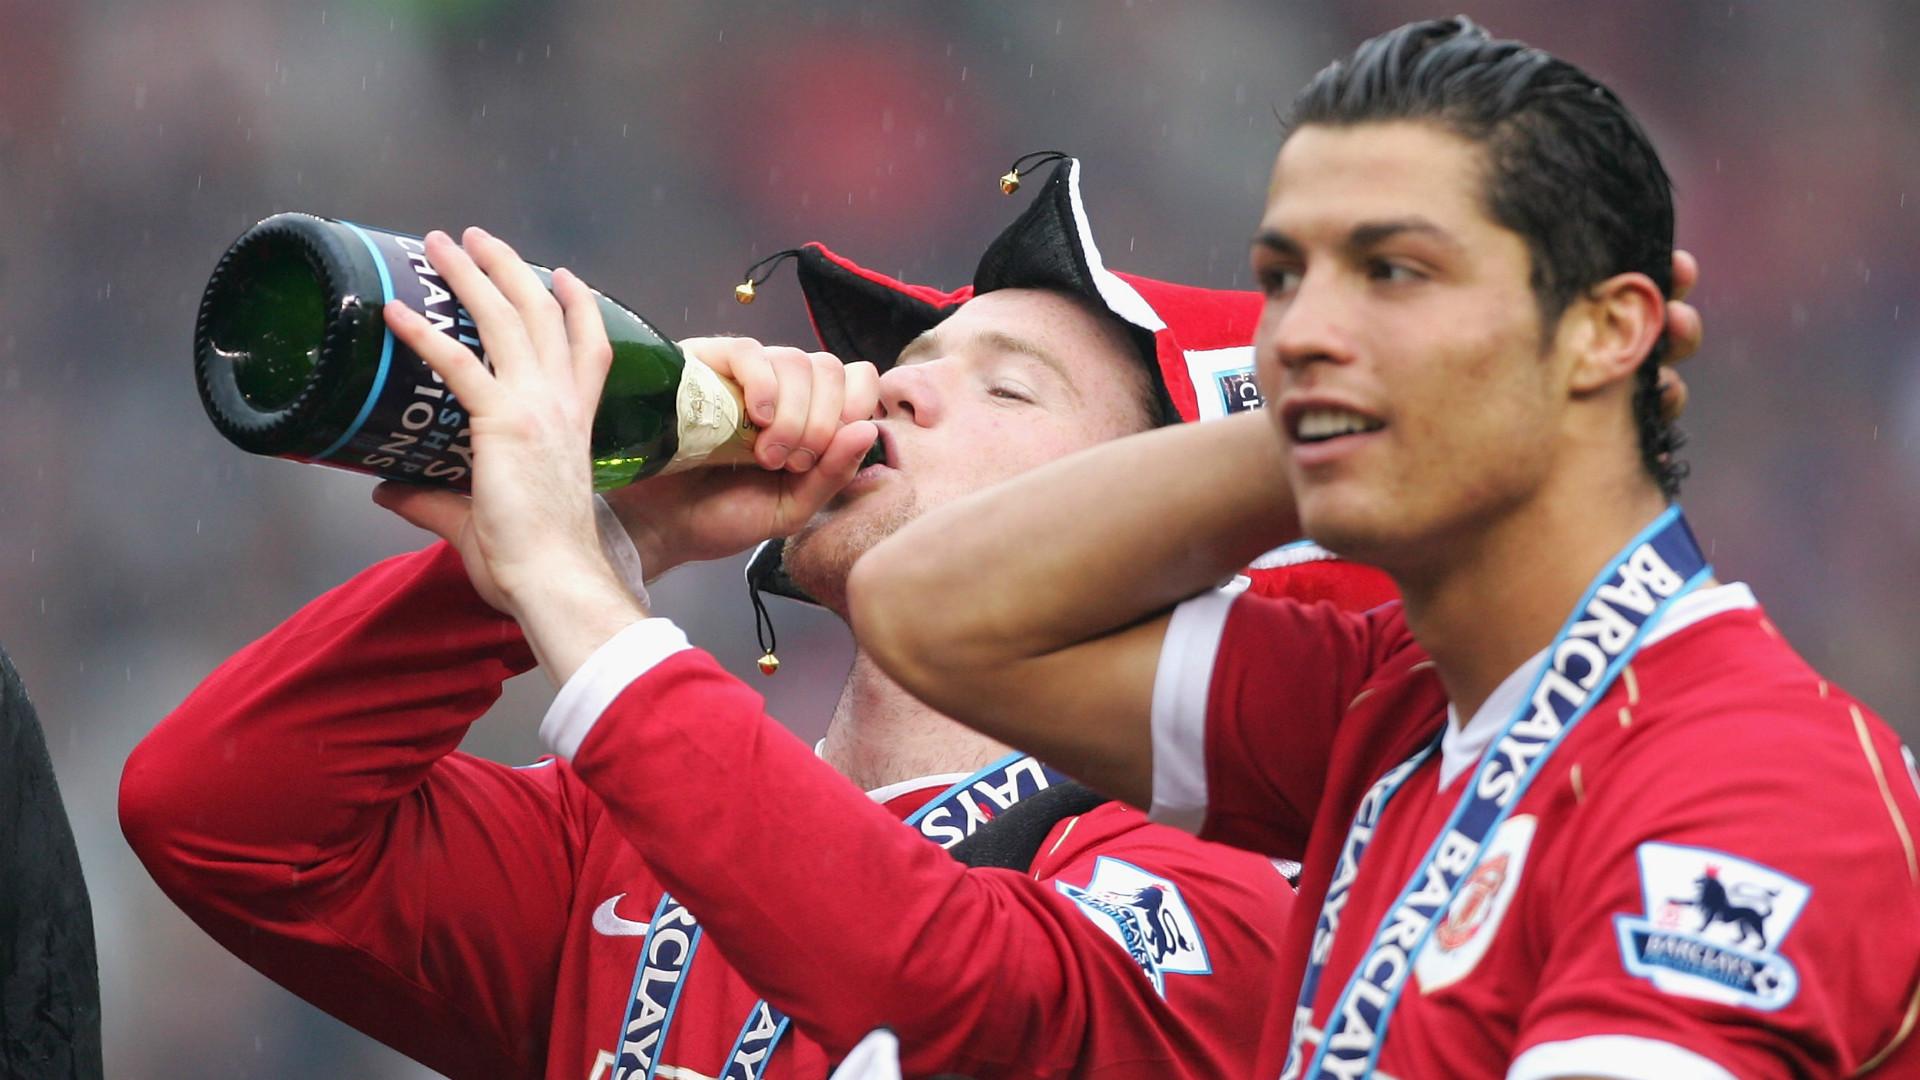 Wayne Rooney Cristiano Ronaldo Premier League champion 2007